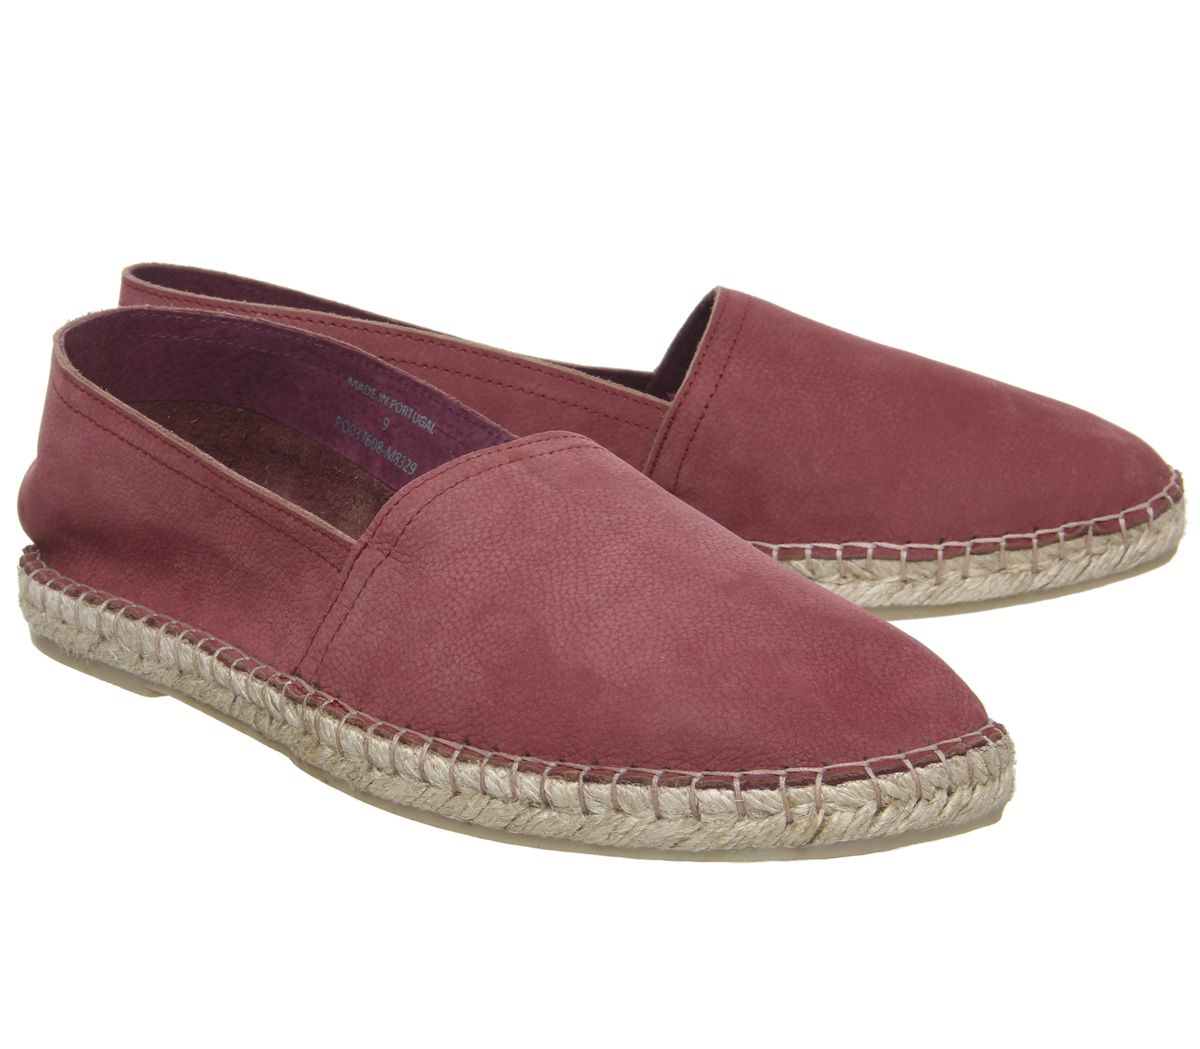 Mens-Office-Luca-Espadrilles-Terracotta-Nubuck-Casual-Shoes thumbnail 5